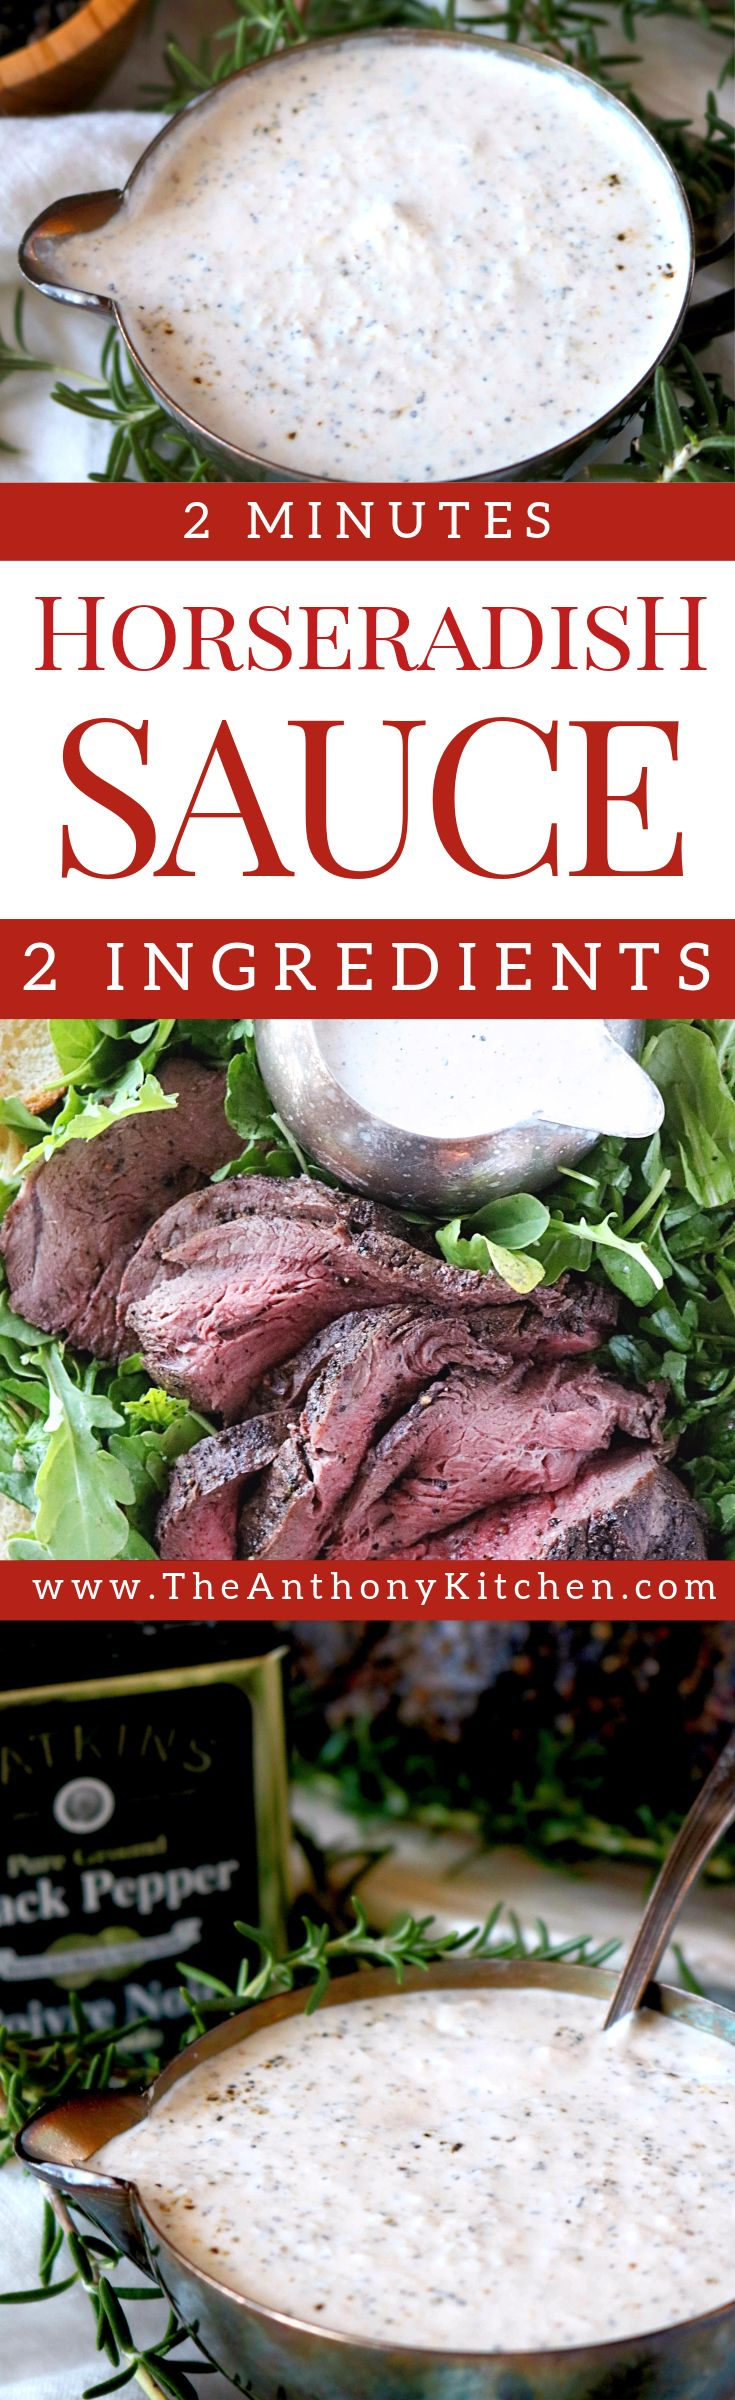 Horseradish Sauce | Steak Side | A simple recipe for creamy, homemade horseradish sauce featuring store-bought, prepared horseradish and sour cream | #steaksauce #horseradish